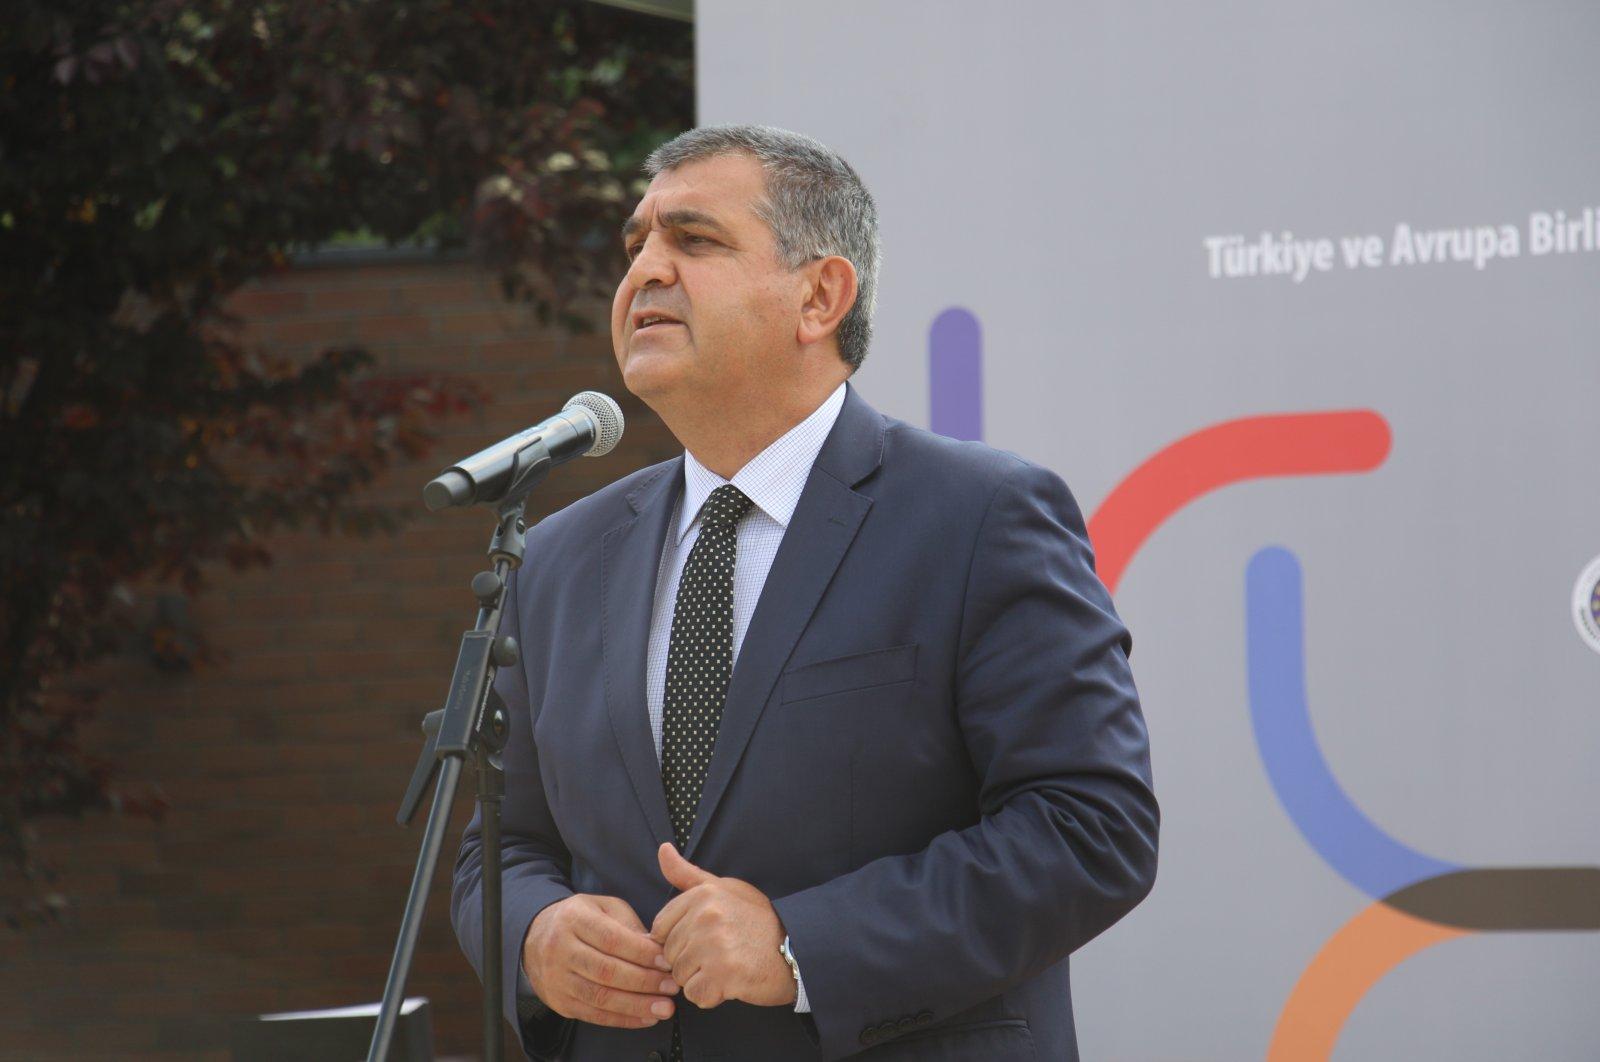 Deputy Foreign Minister Faruk Kaymakcı speaking at an event in Ankara, Turkey, July 27, 2021. (IHA Photo)